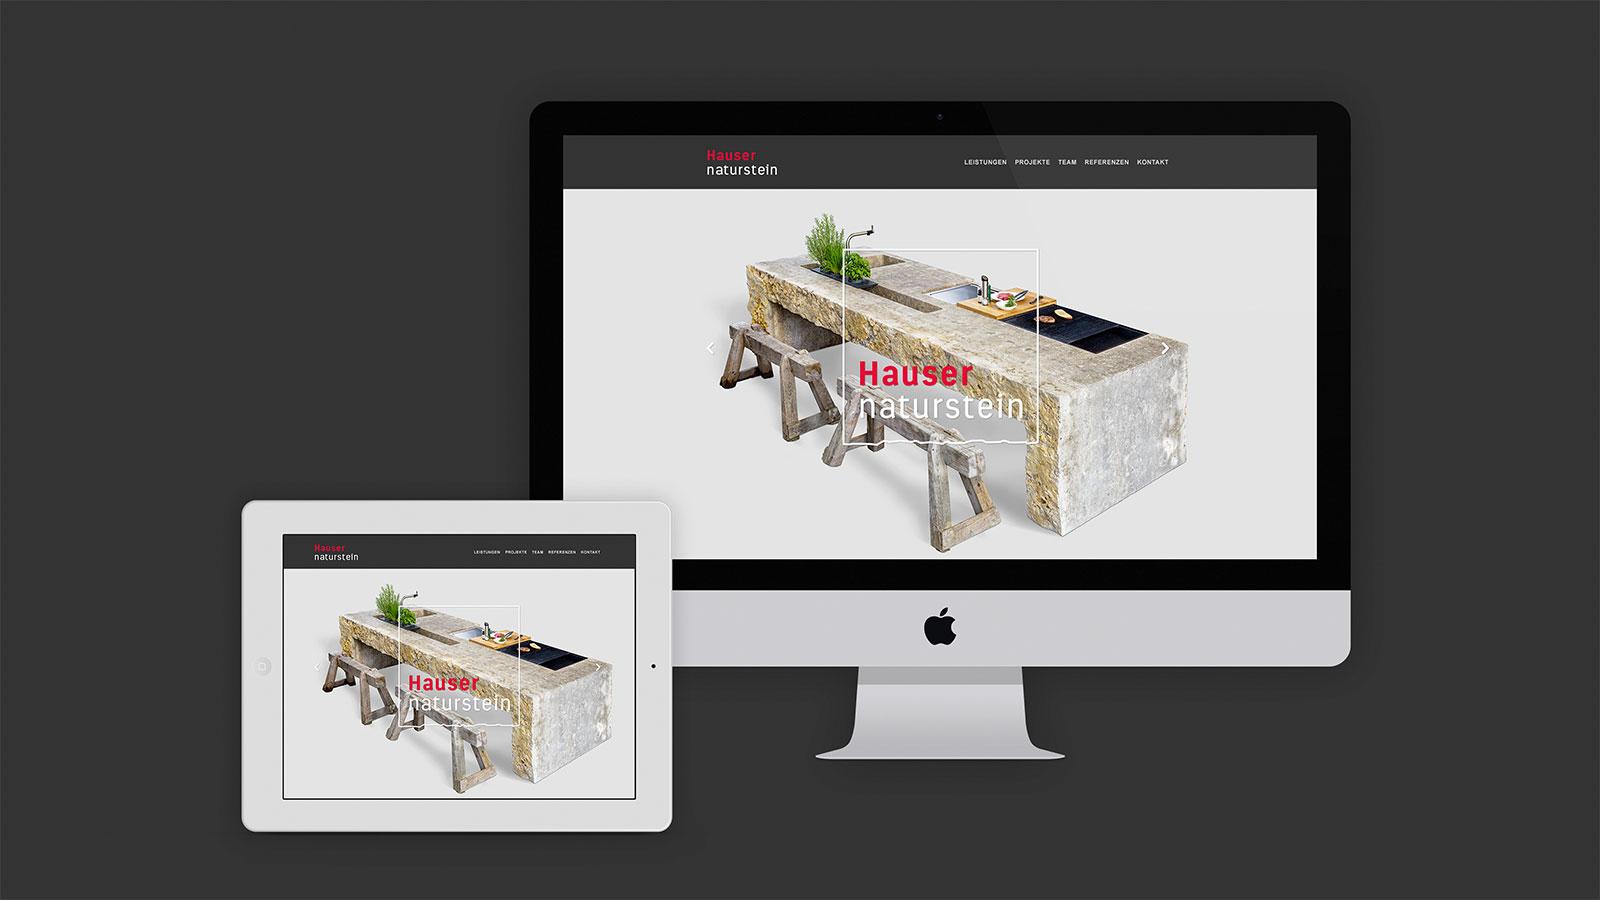 hauser-homepage-1